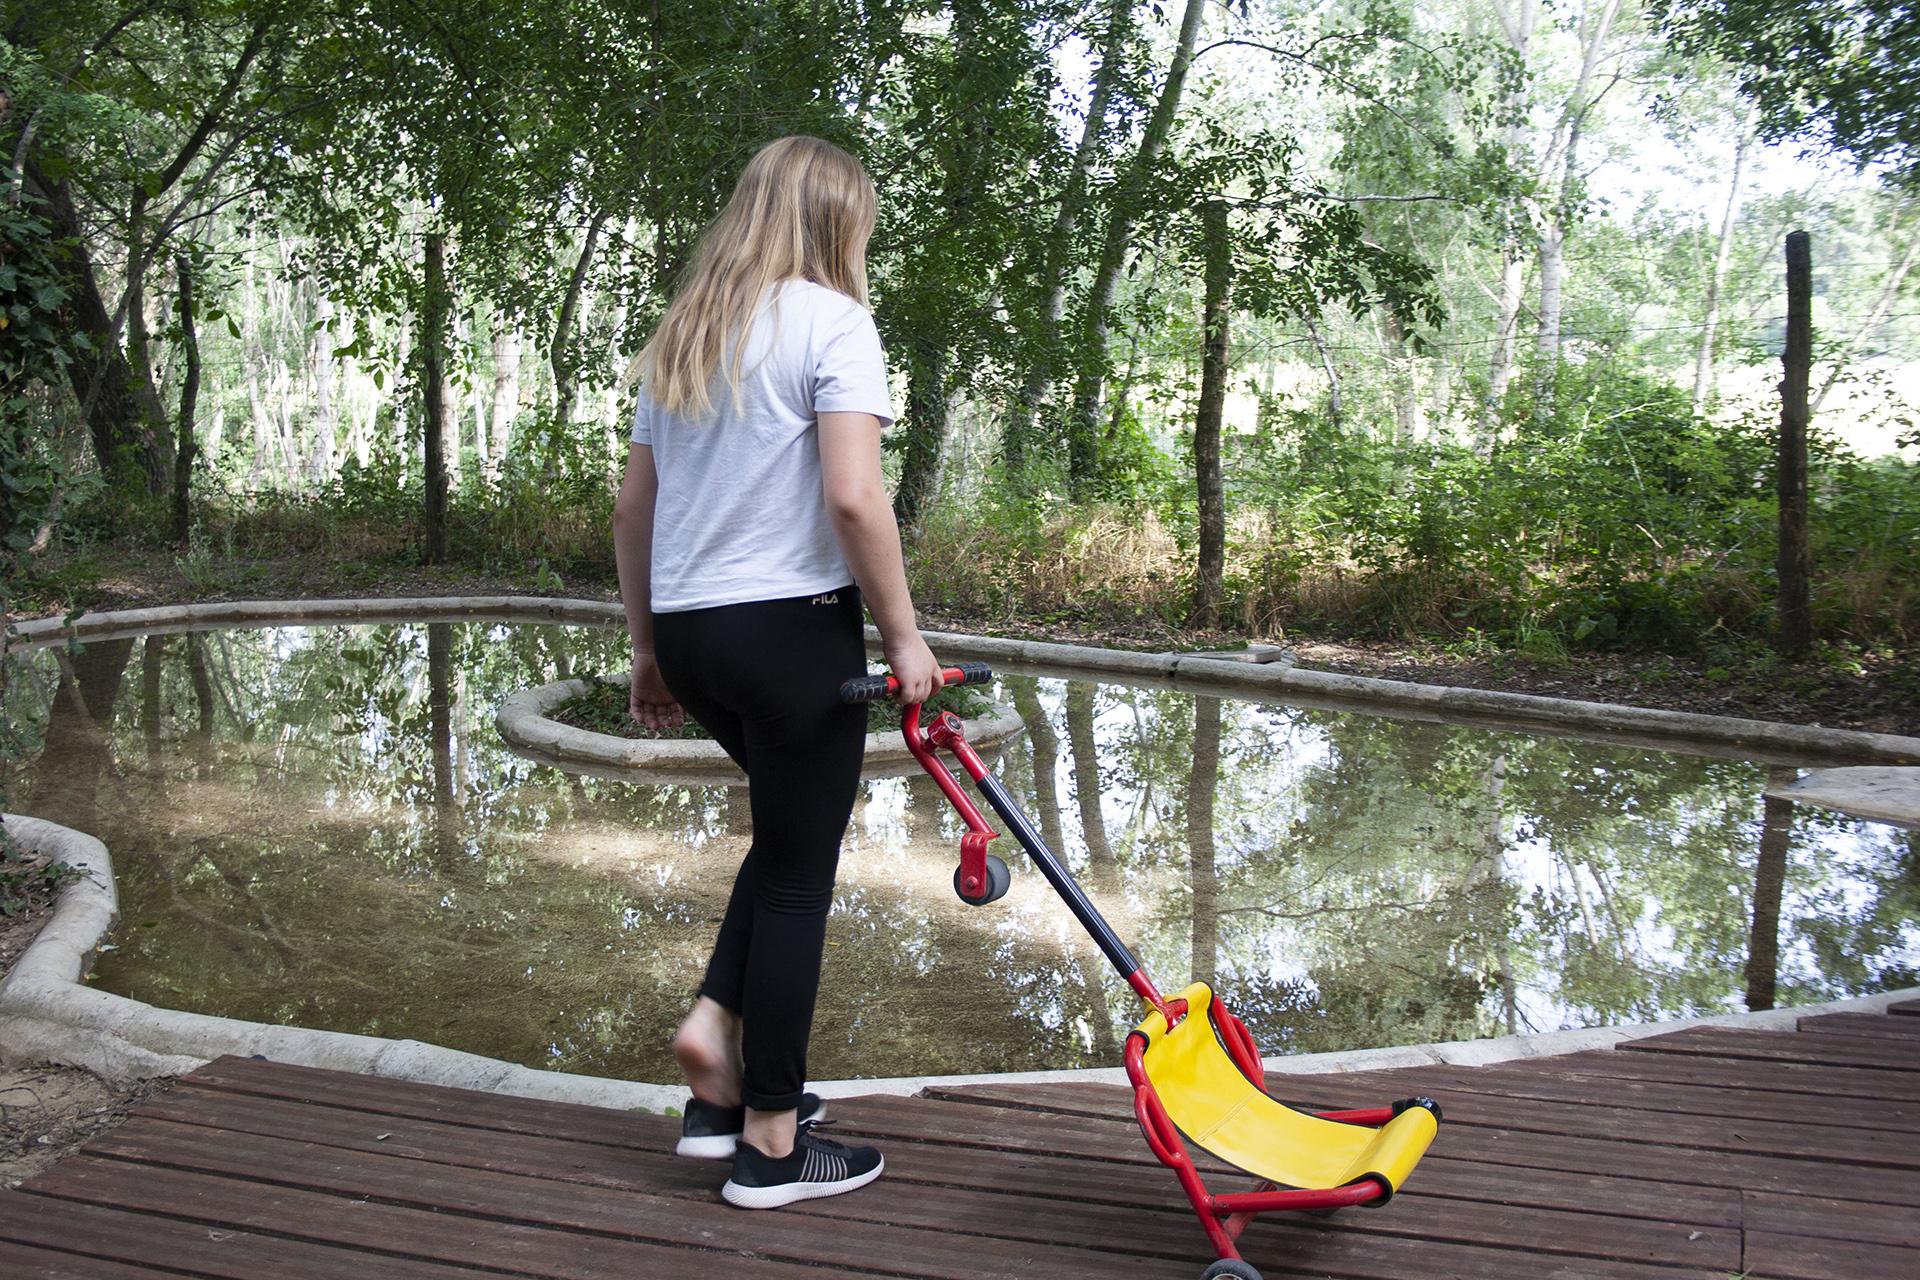 Swingroller devant la piste aquatique